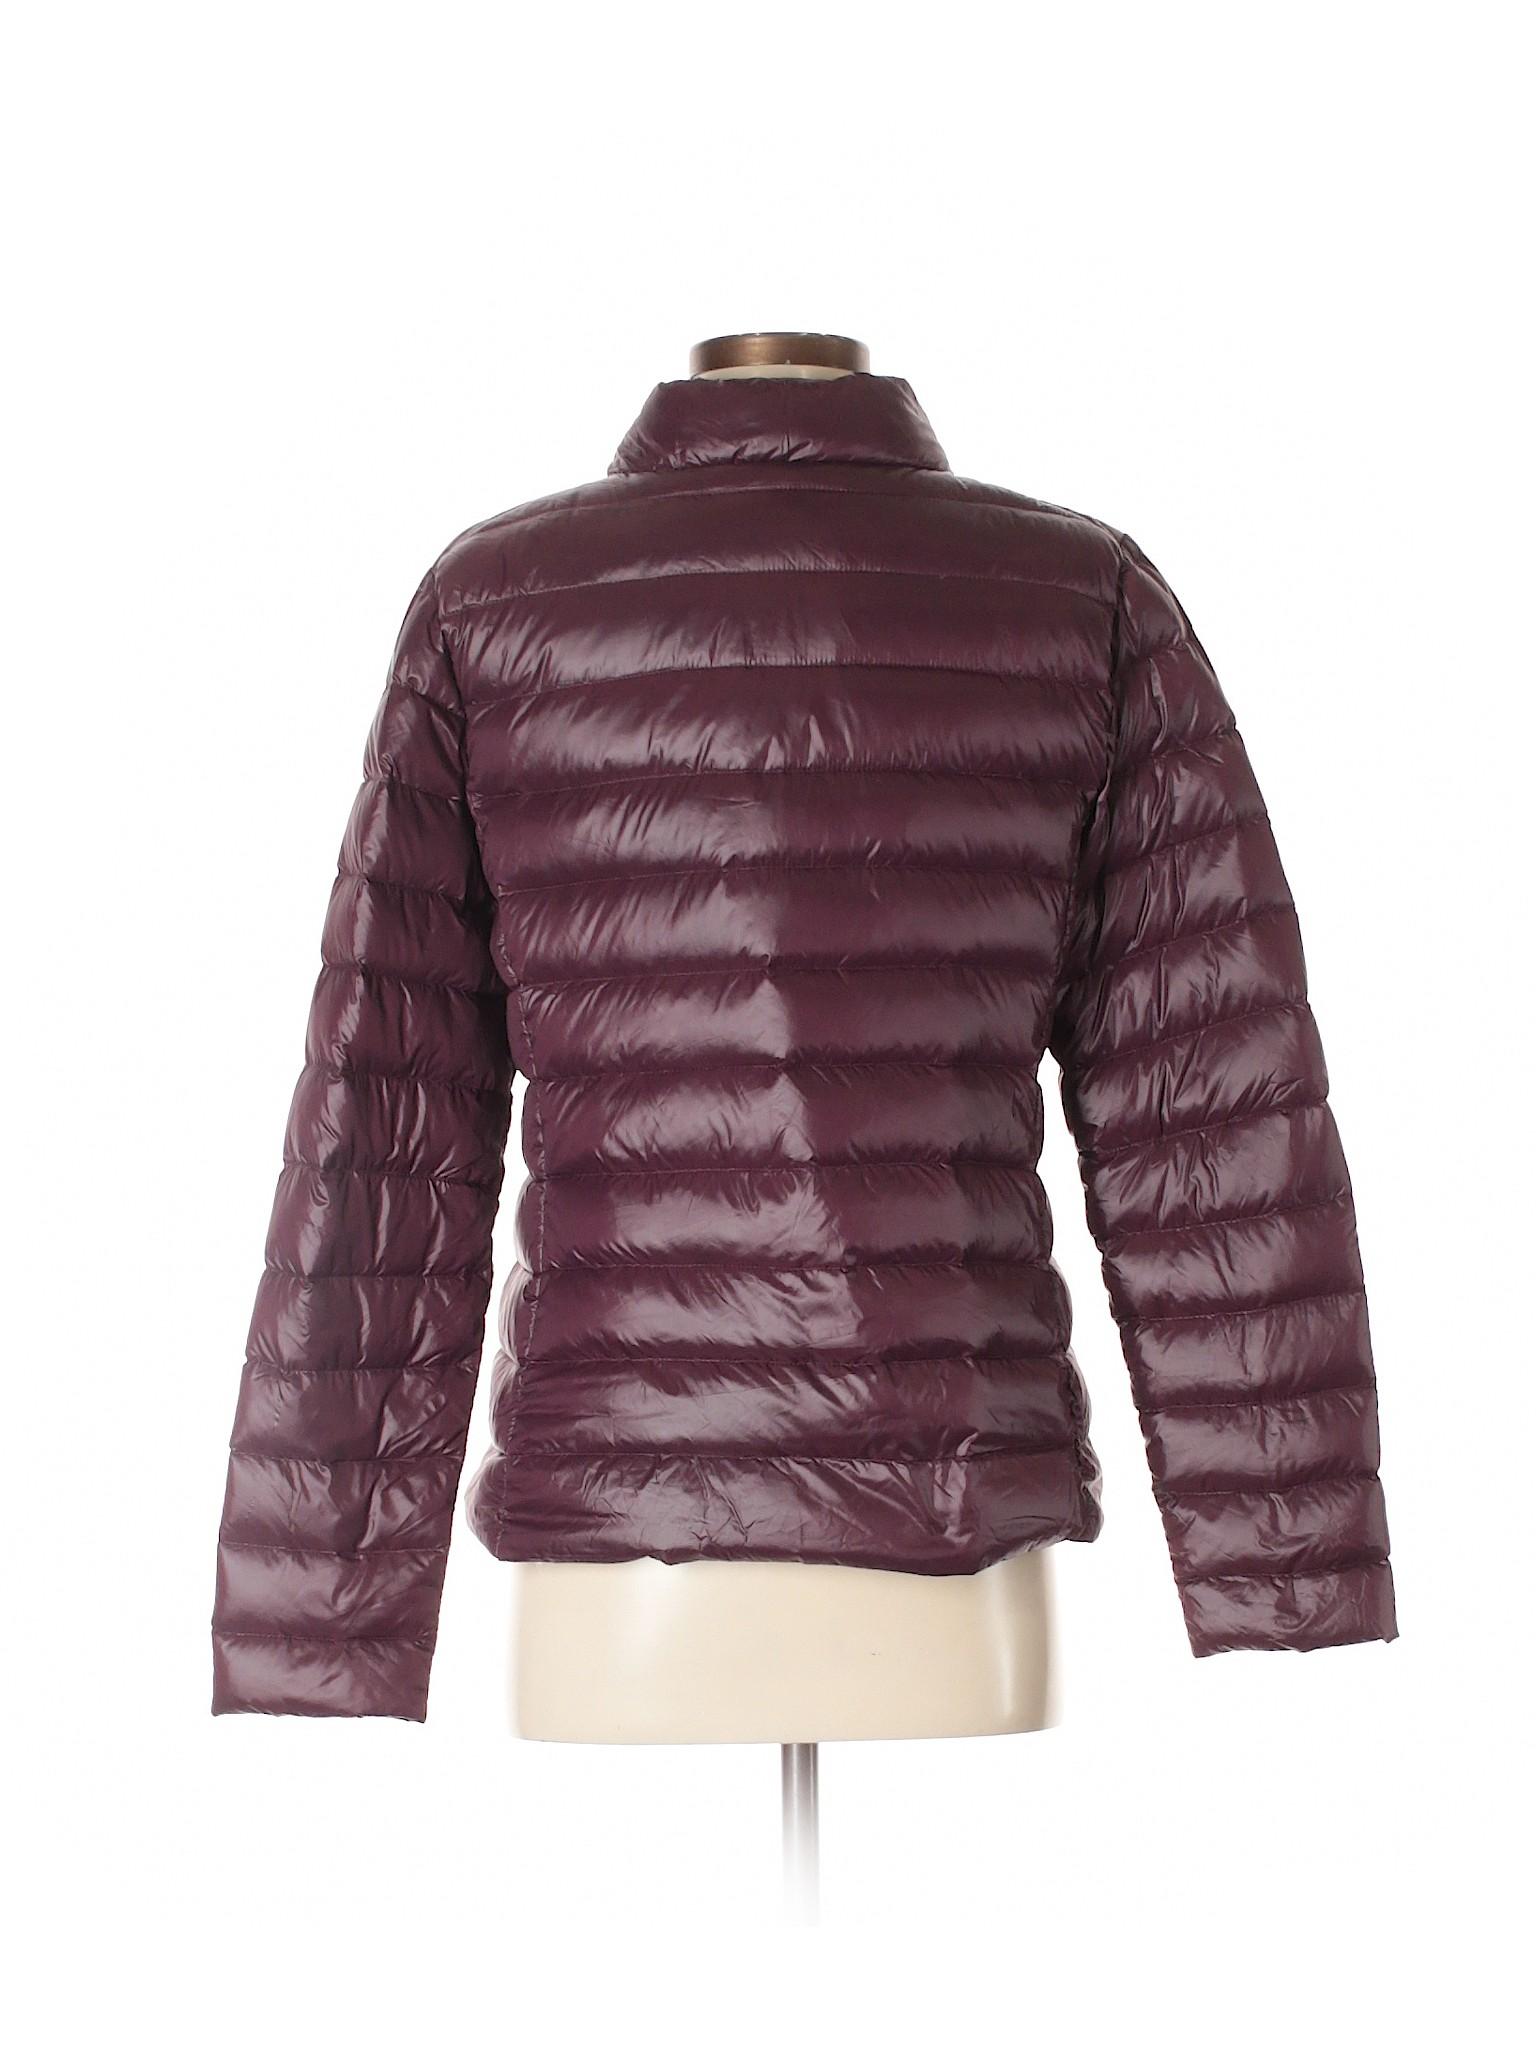 Boutique Via Spiga Coat winter Boutique winter z7q1wPUa